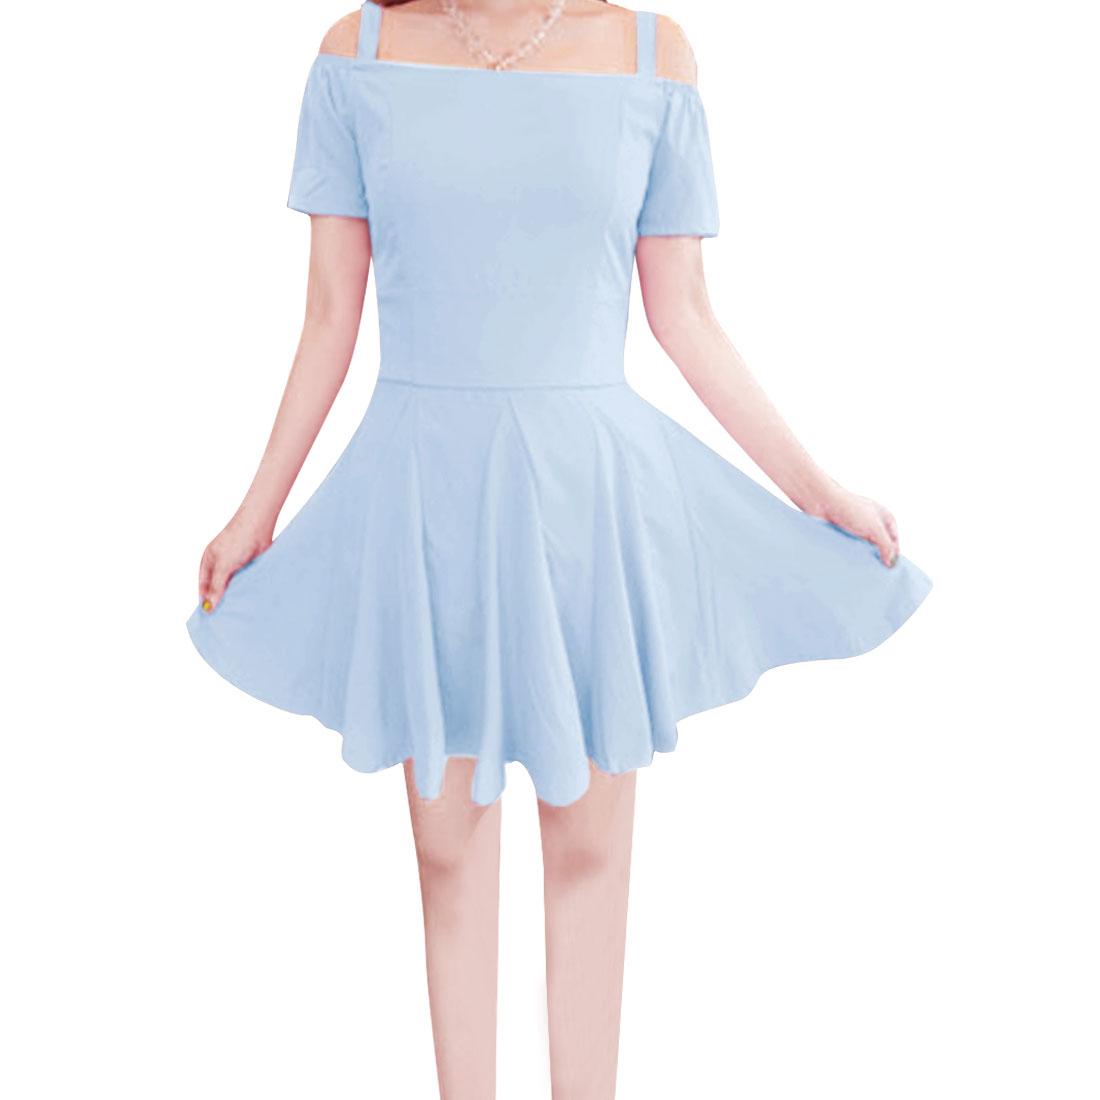 Ladies Short Sleeve Pullover Stylish Dress Baby Blue XS